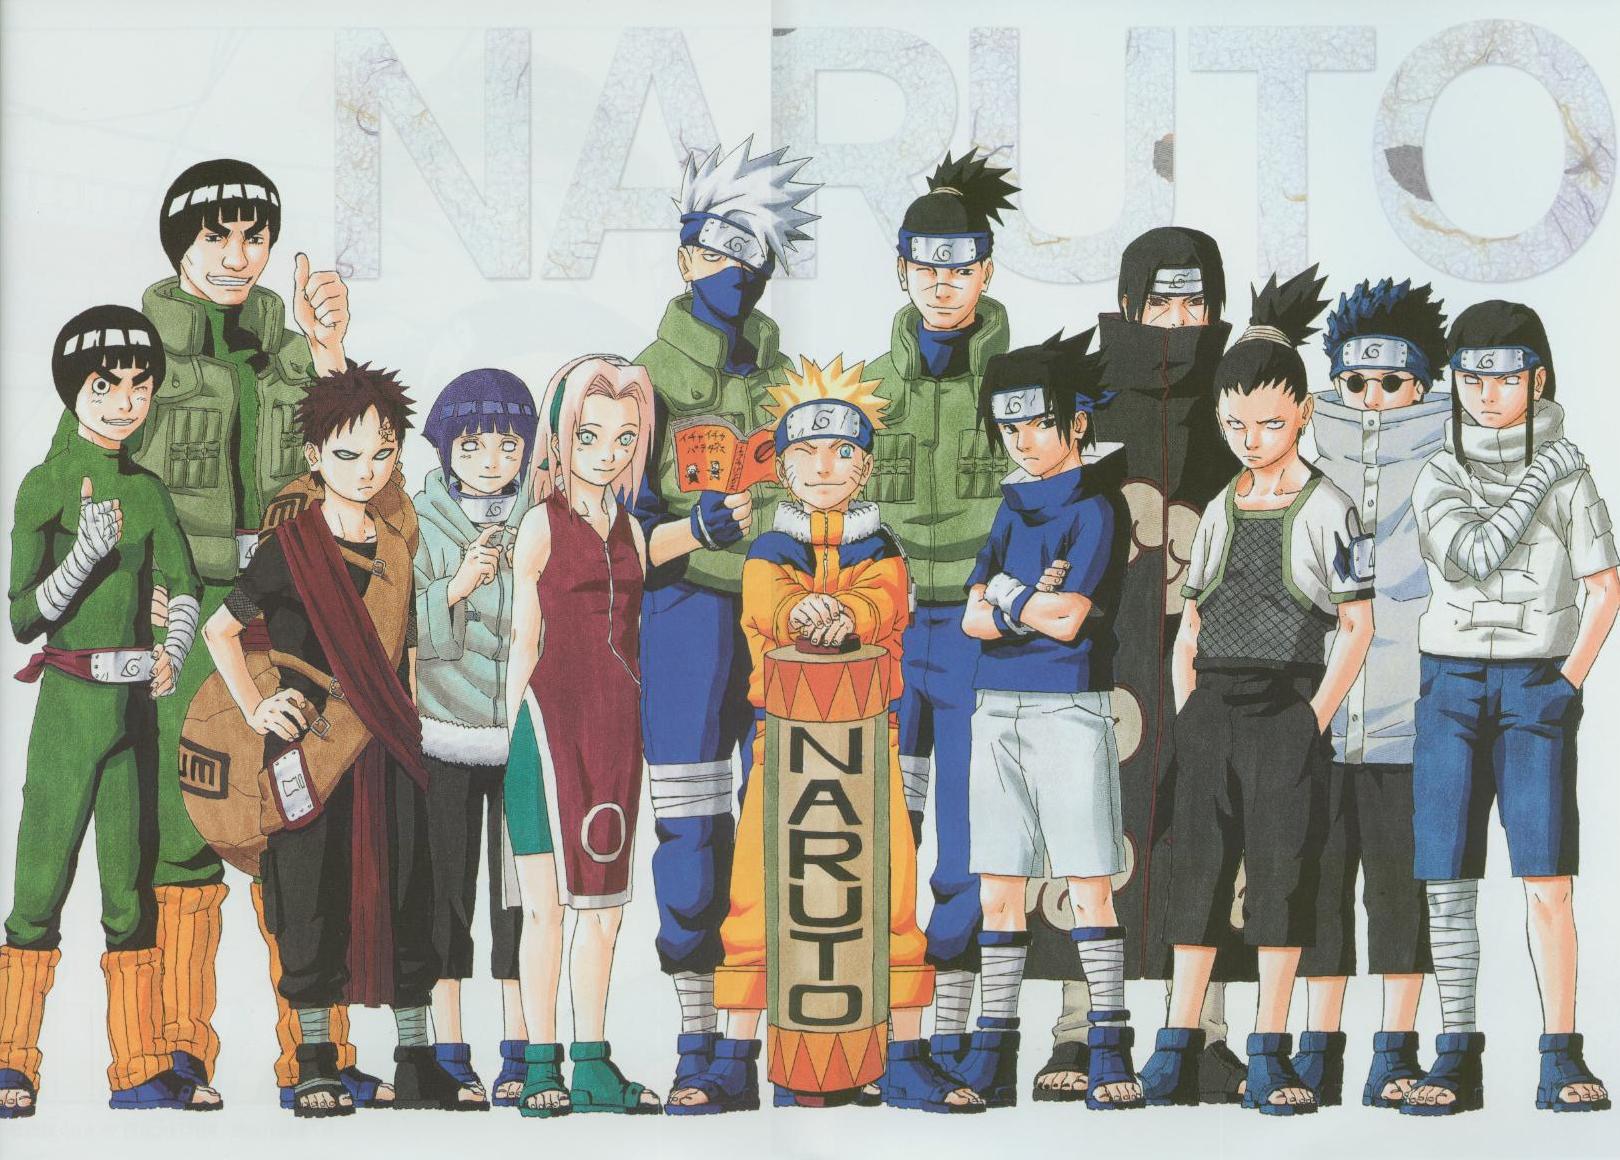 صور الانمى نارتو Naruto%20(56)